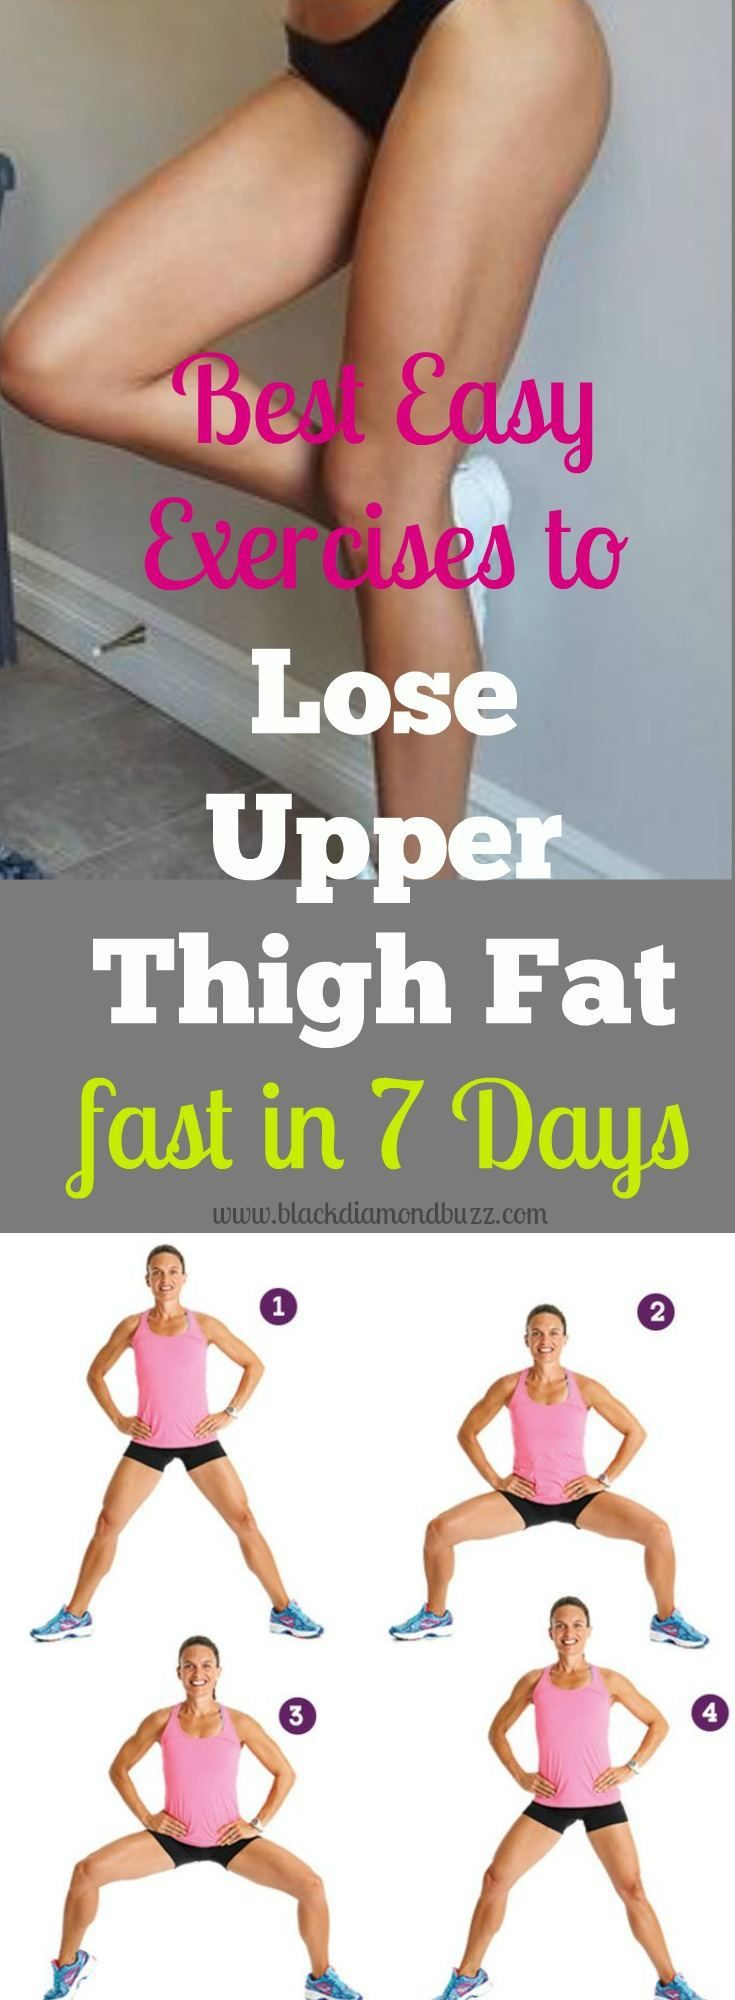 Best belly fat loss diet image 6